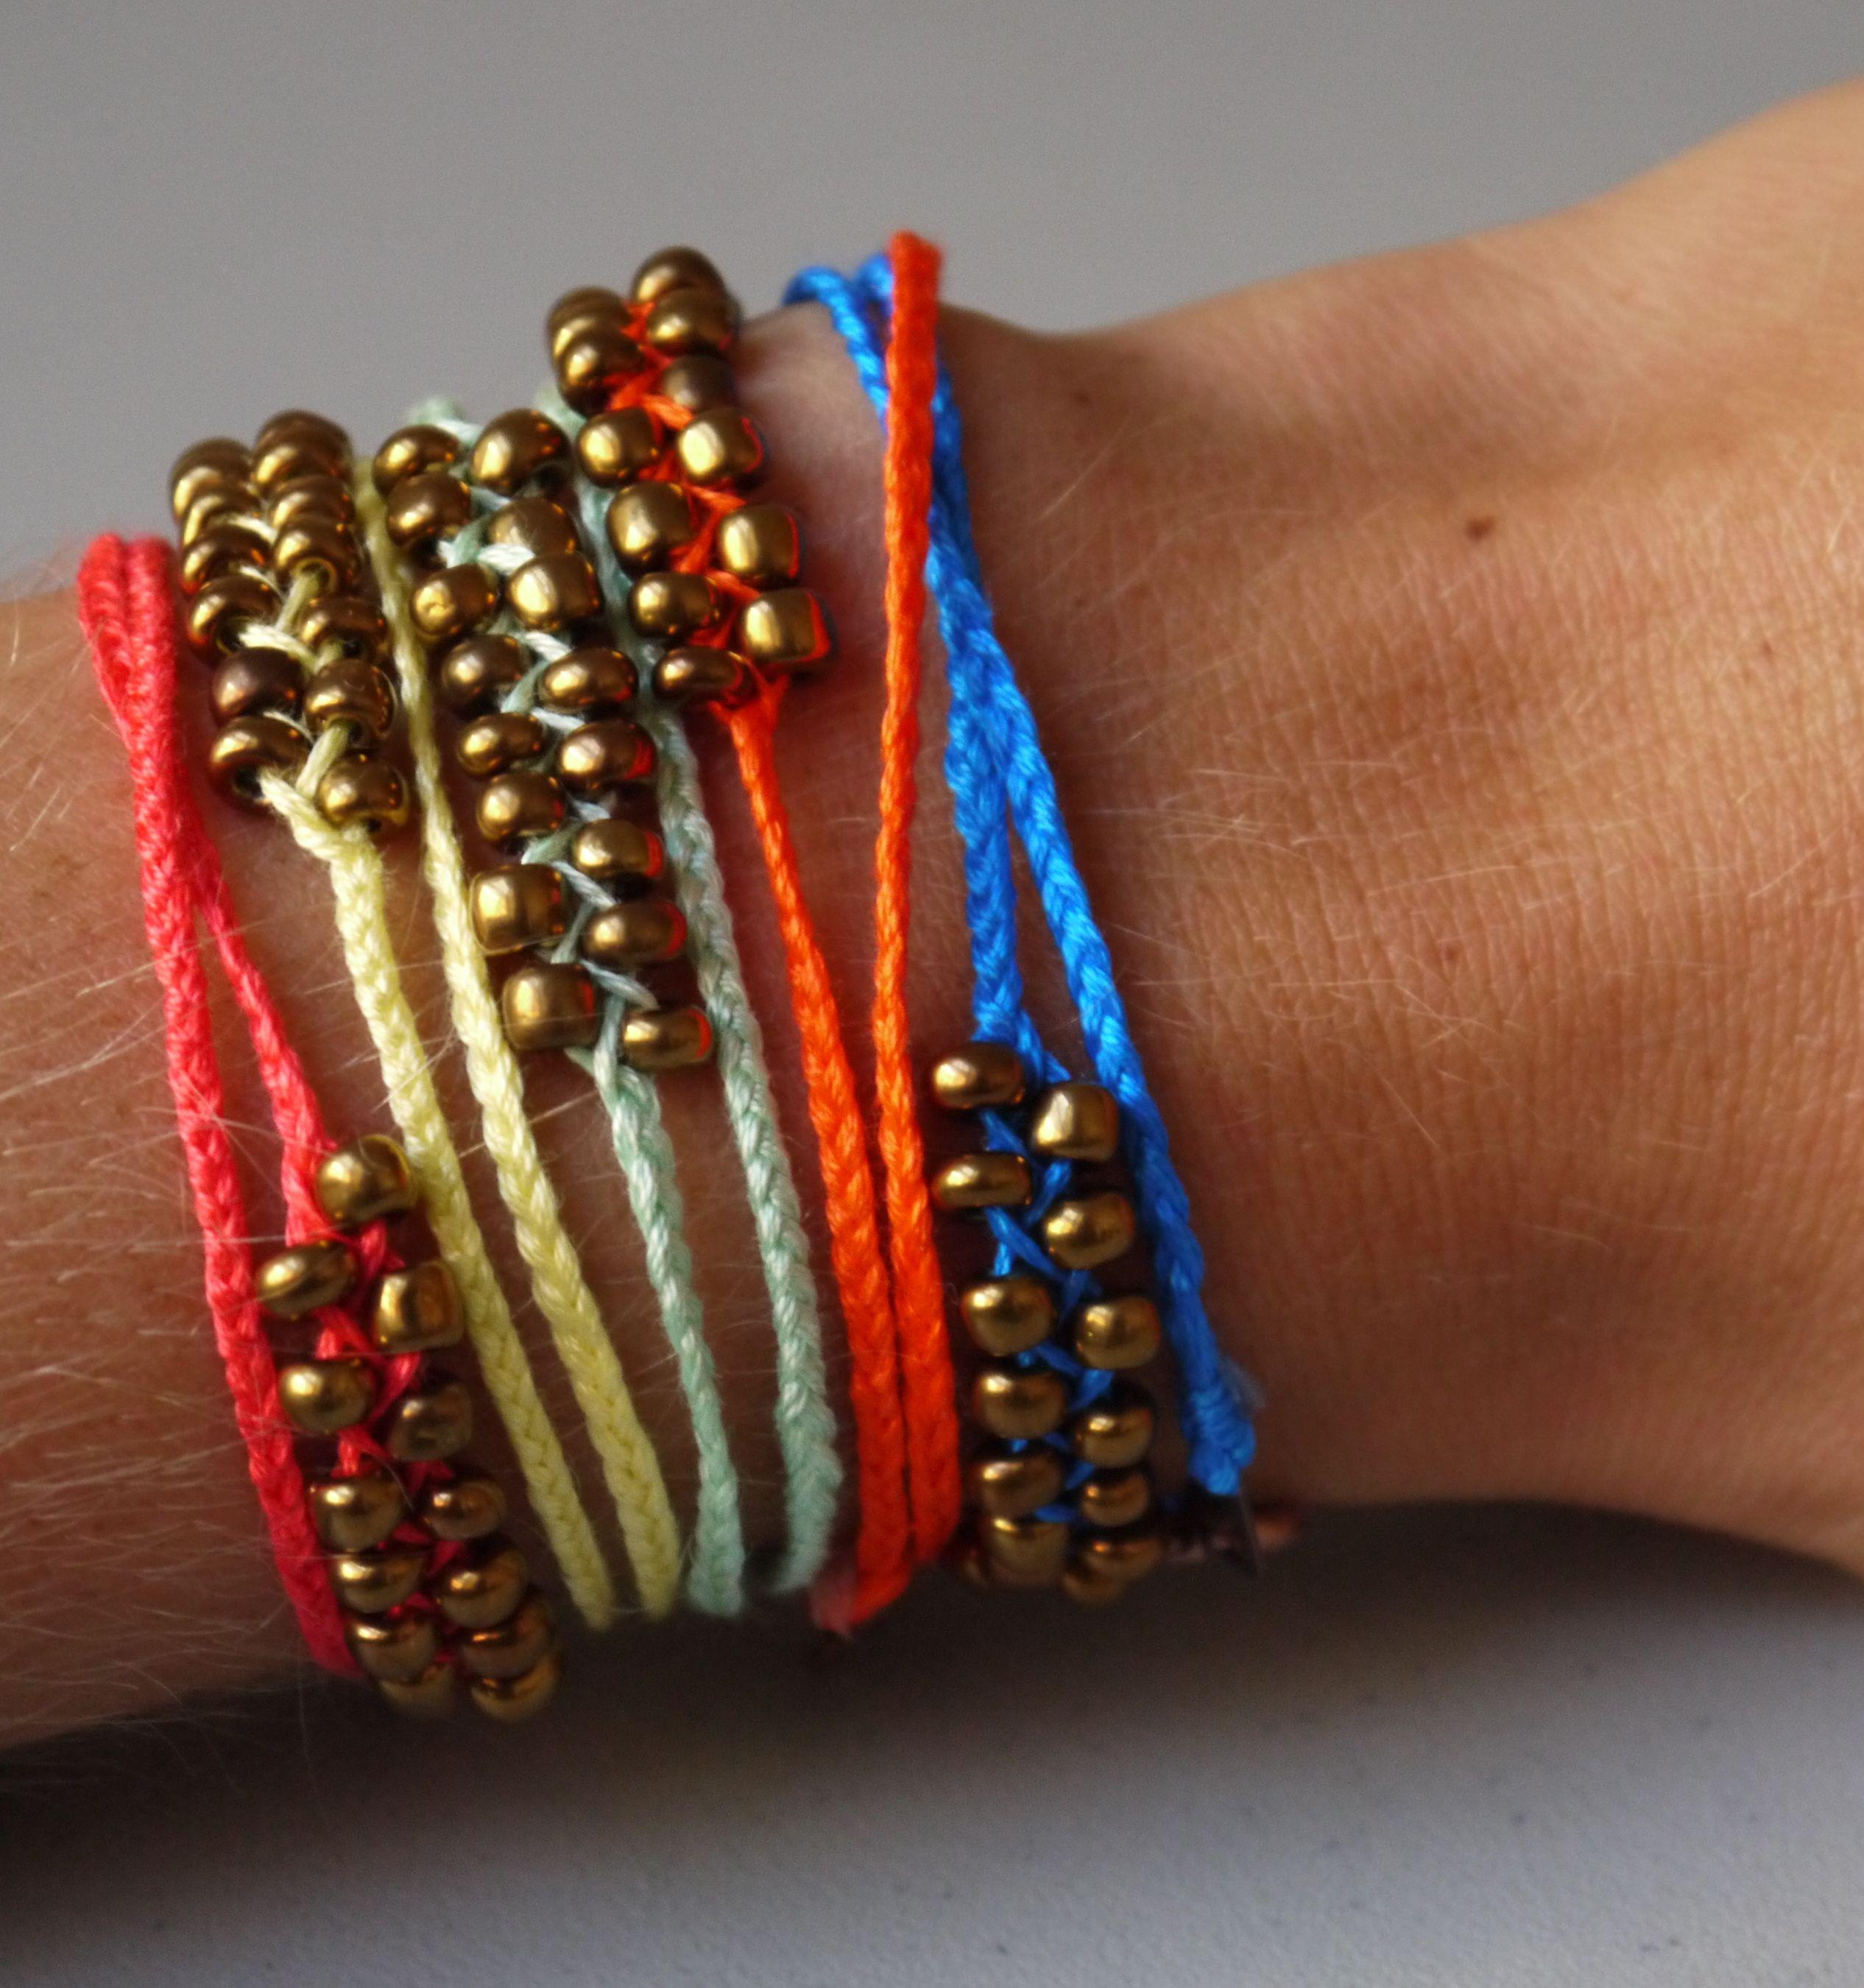 Diy Beads: DIY Neon Braided Bead Bracelets